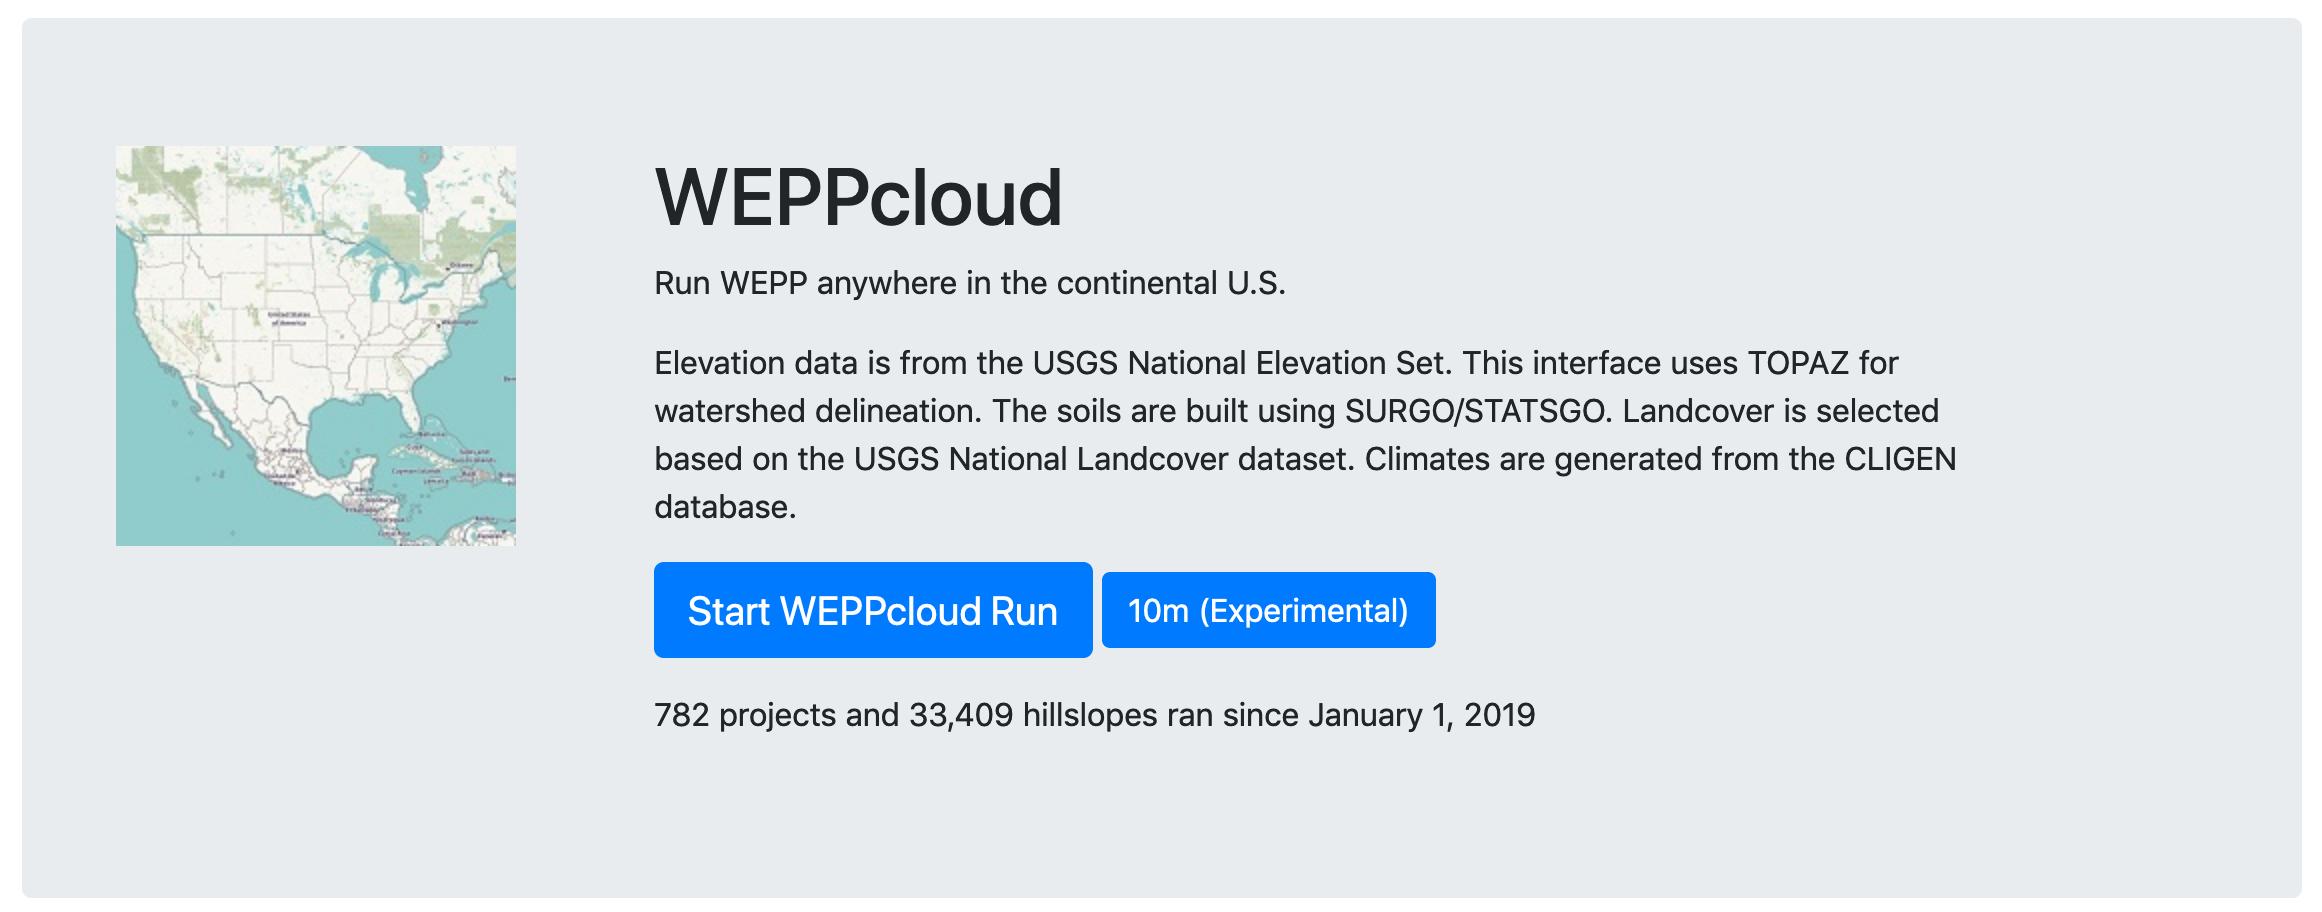 Start WEPPcloud Run